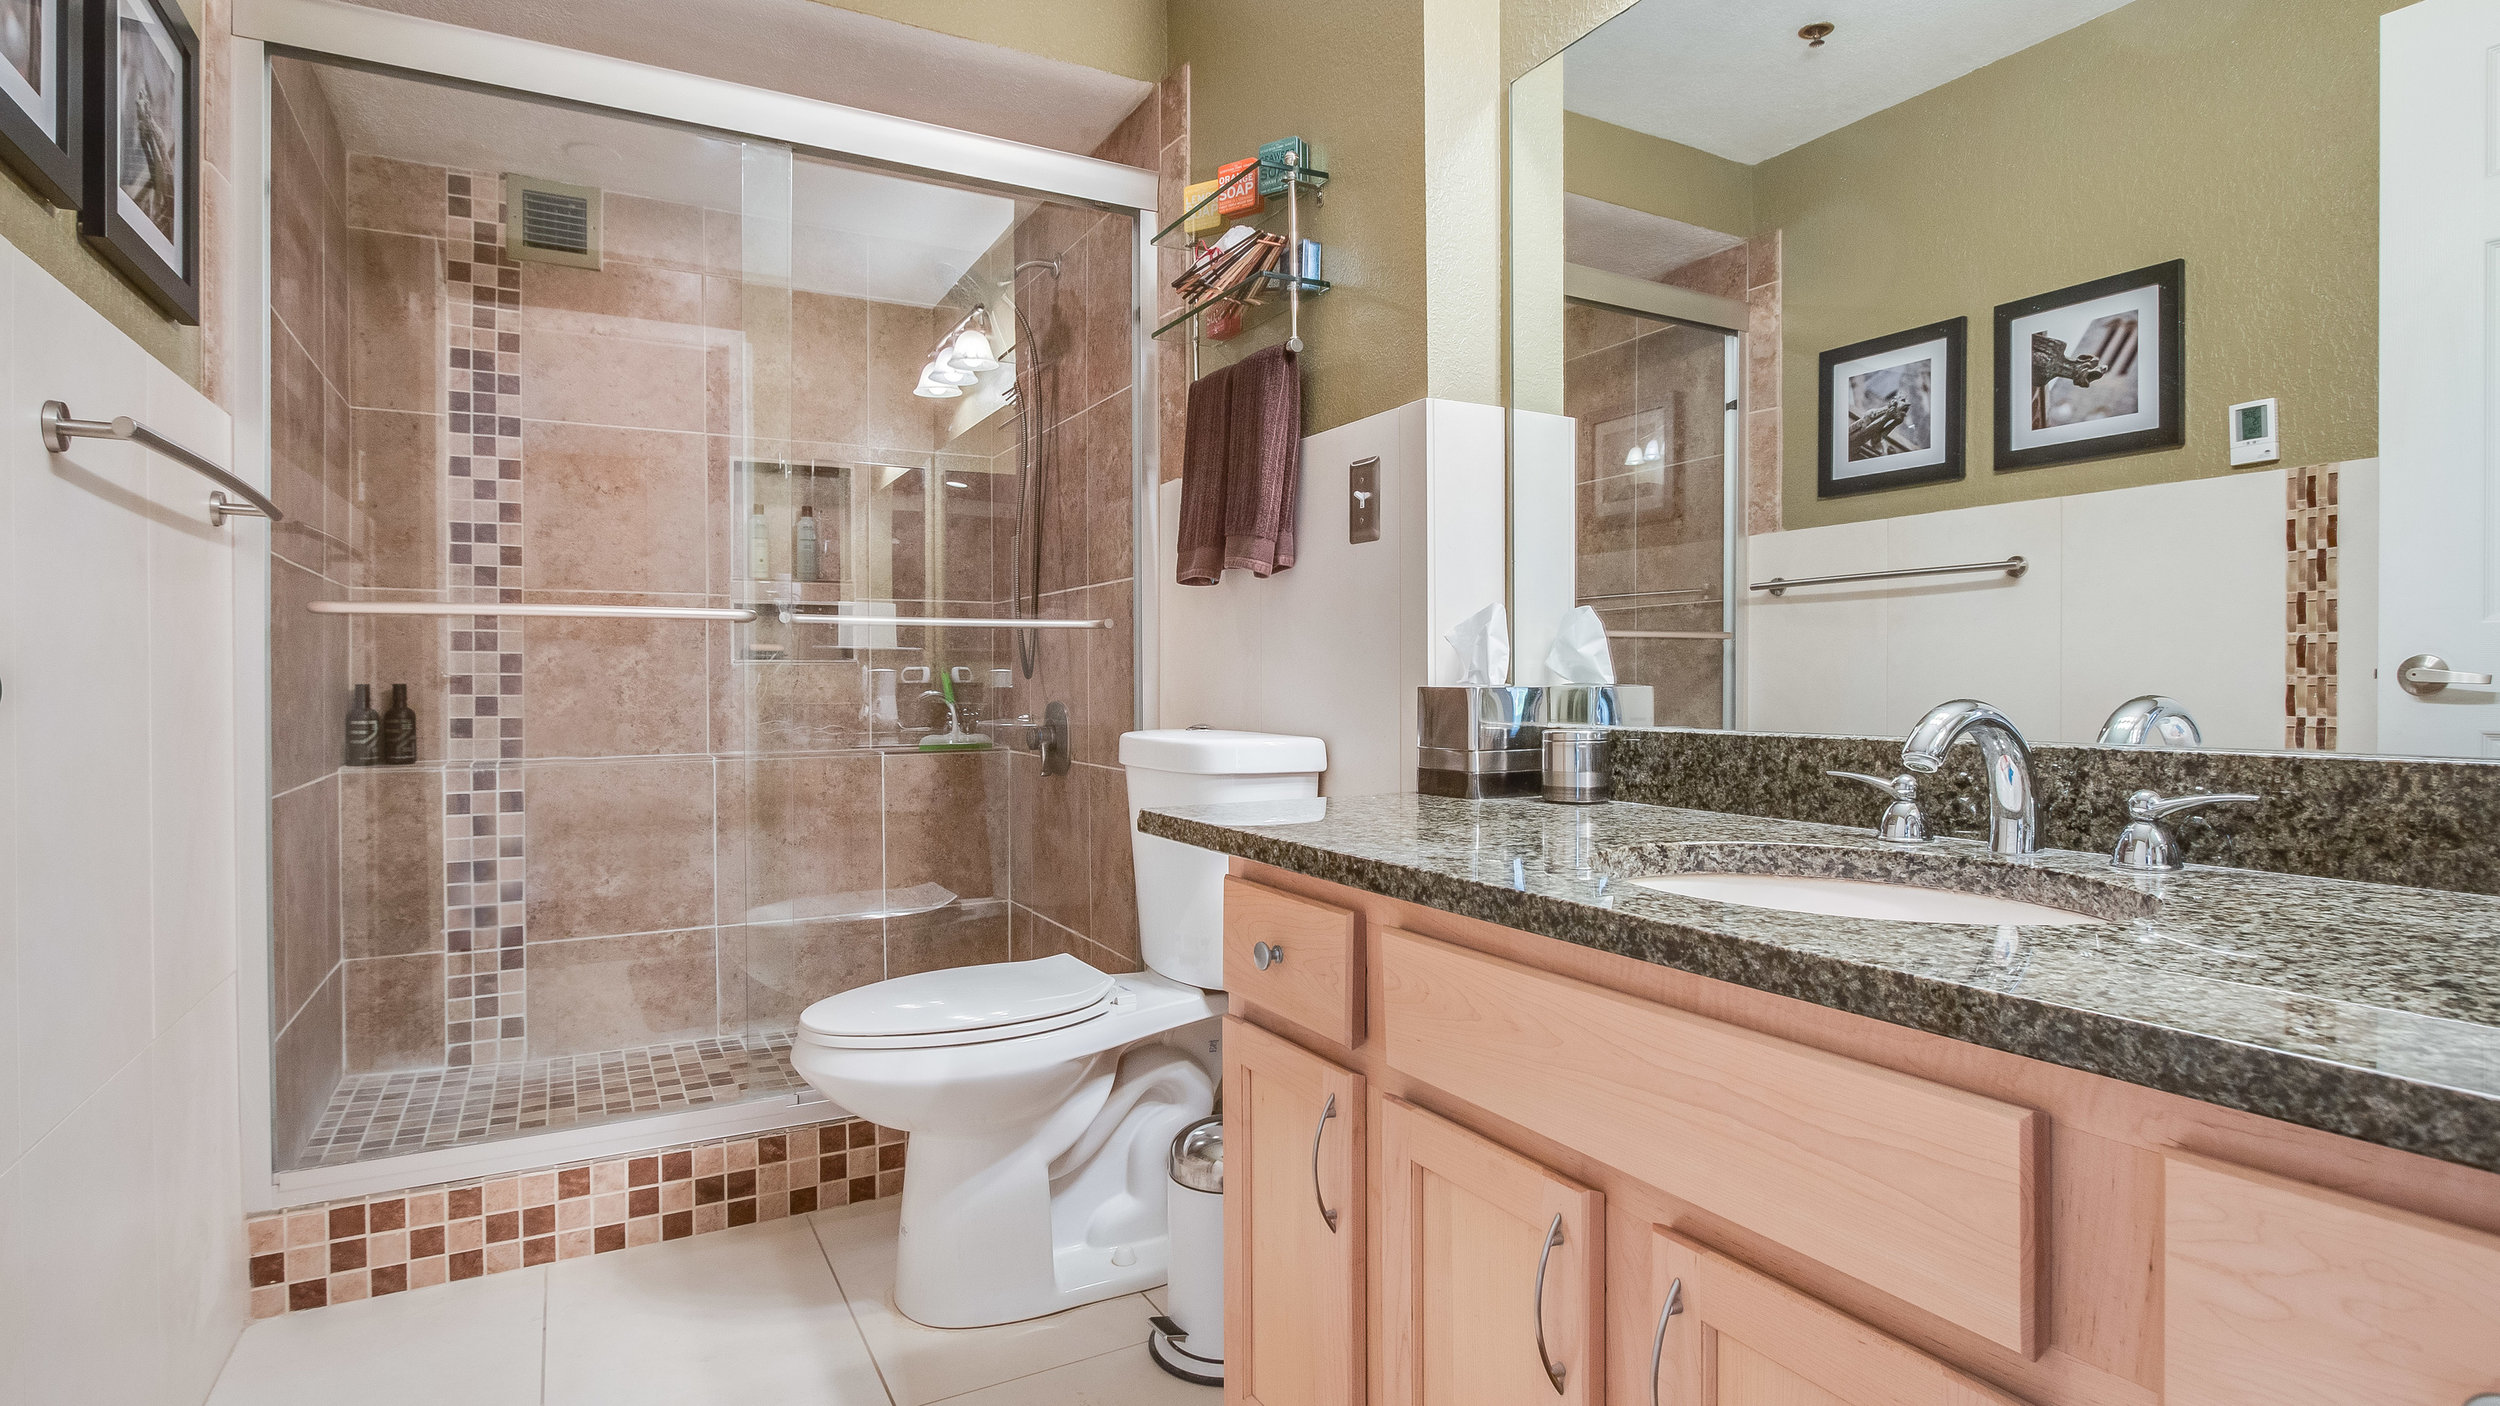 12 44417th206 Bathroom  (11).jpg